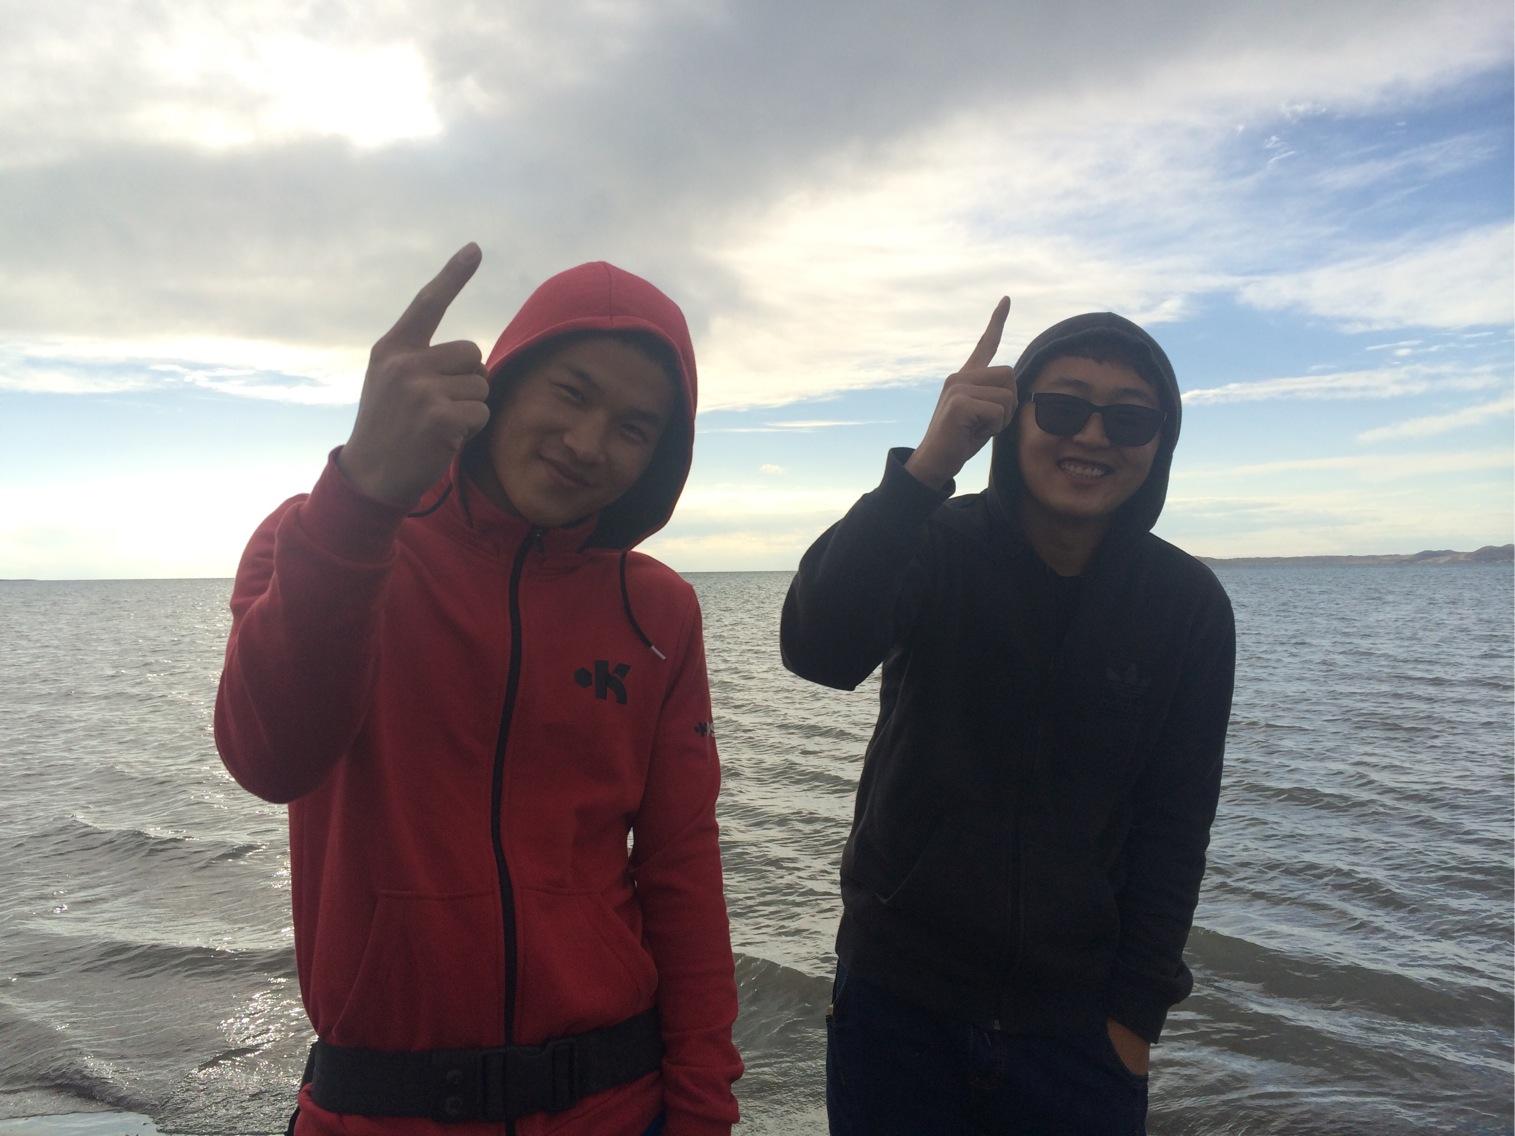 Dachao & Yihzheng, Qinghai Lake, China